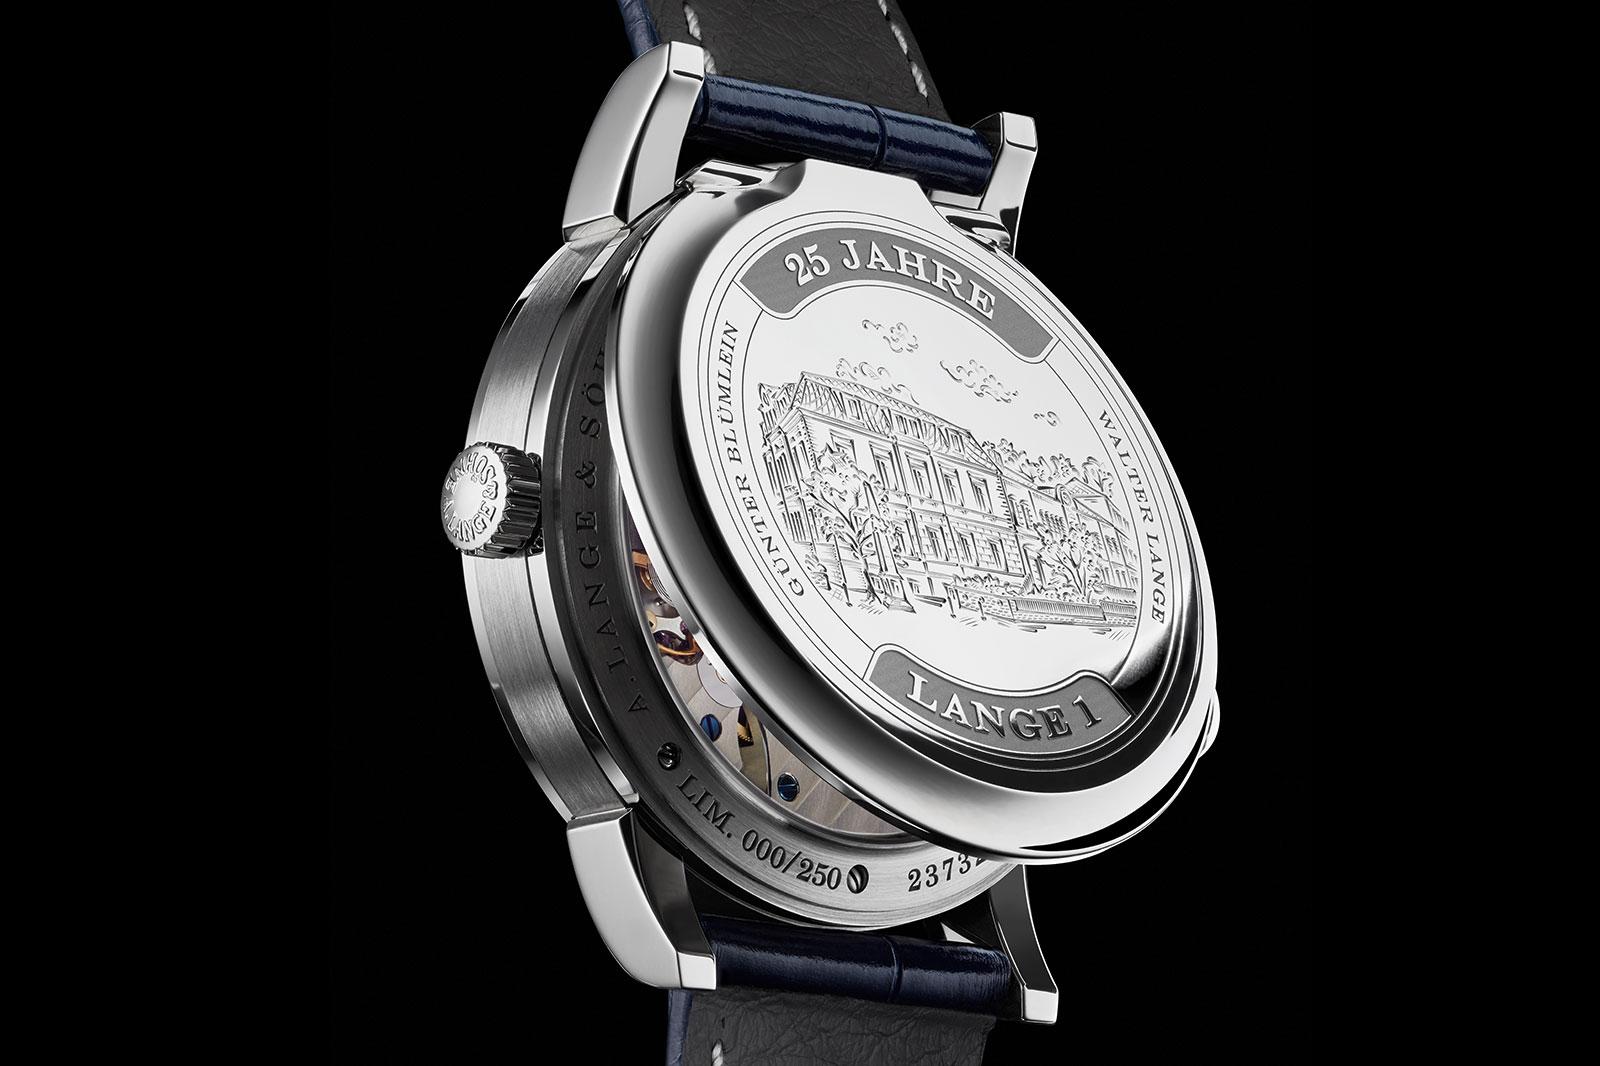 Lange-1-25th-Anniversary-watch-8